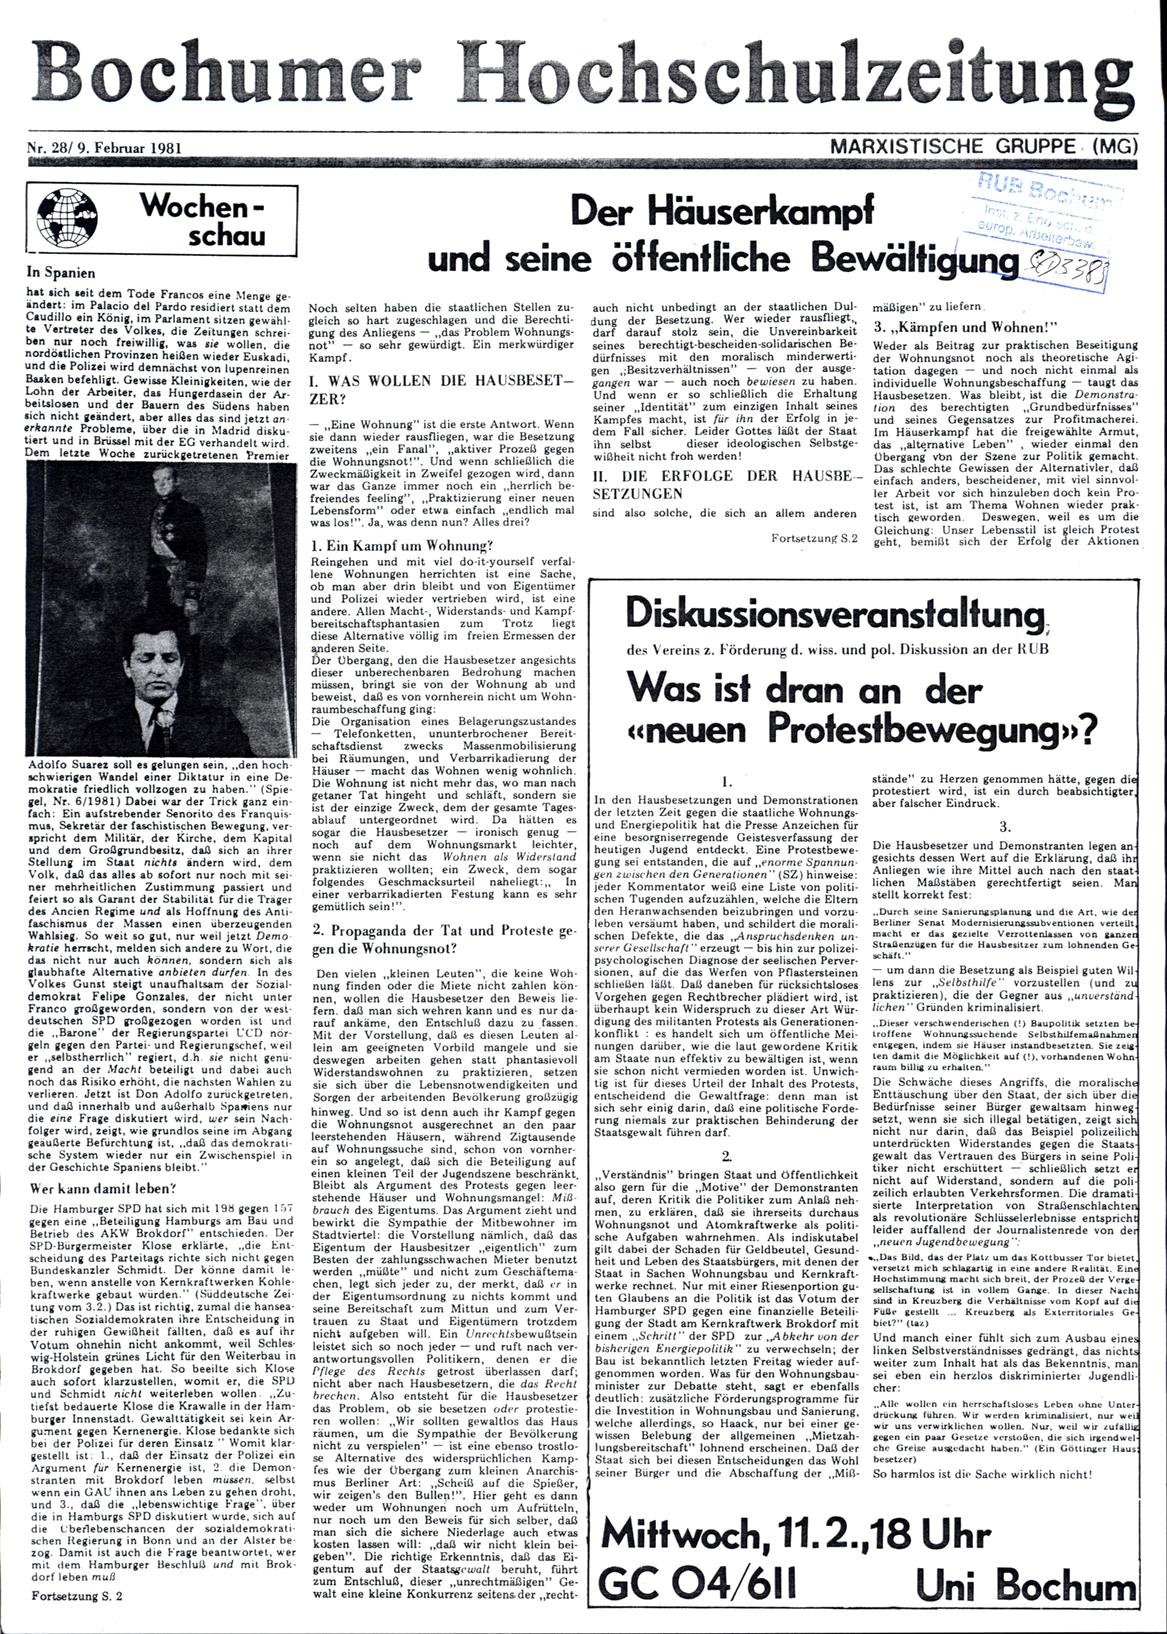 Bochum_BHZ_19810209_028_001